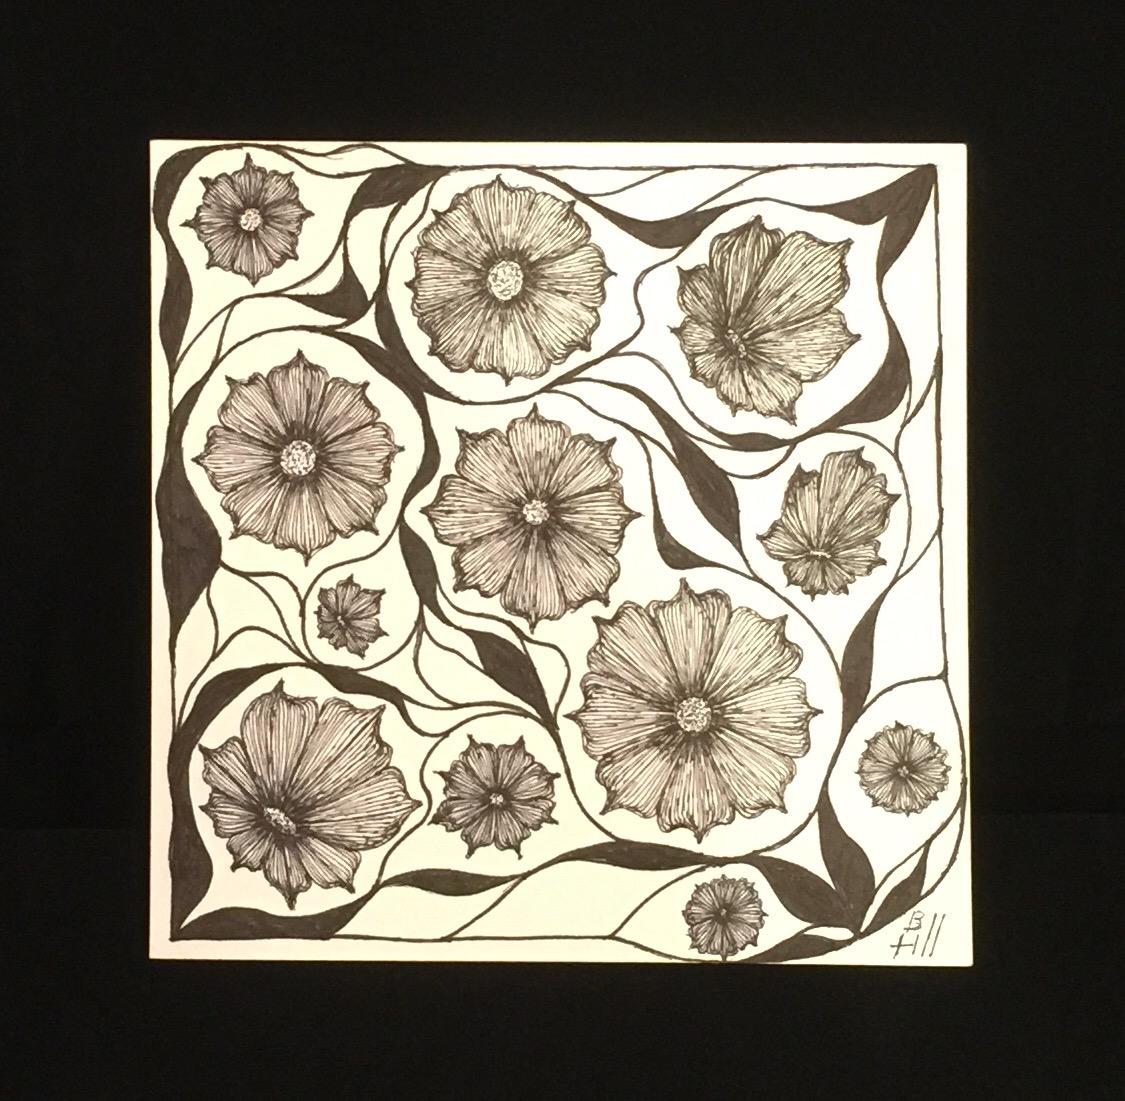 Floral Arrangement. Micron pens on Strathmore 300 Series Vellum. 6